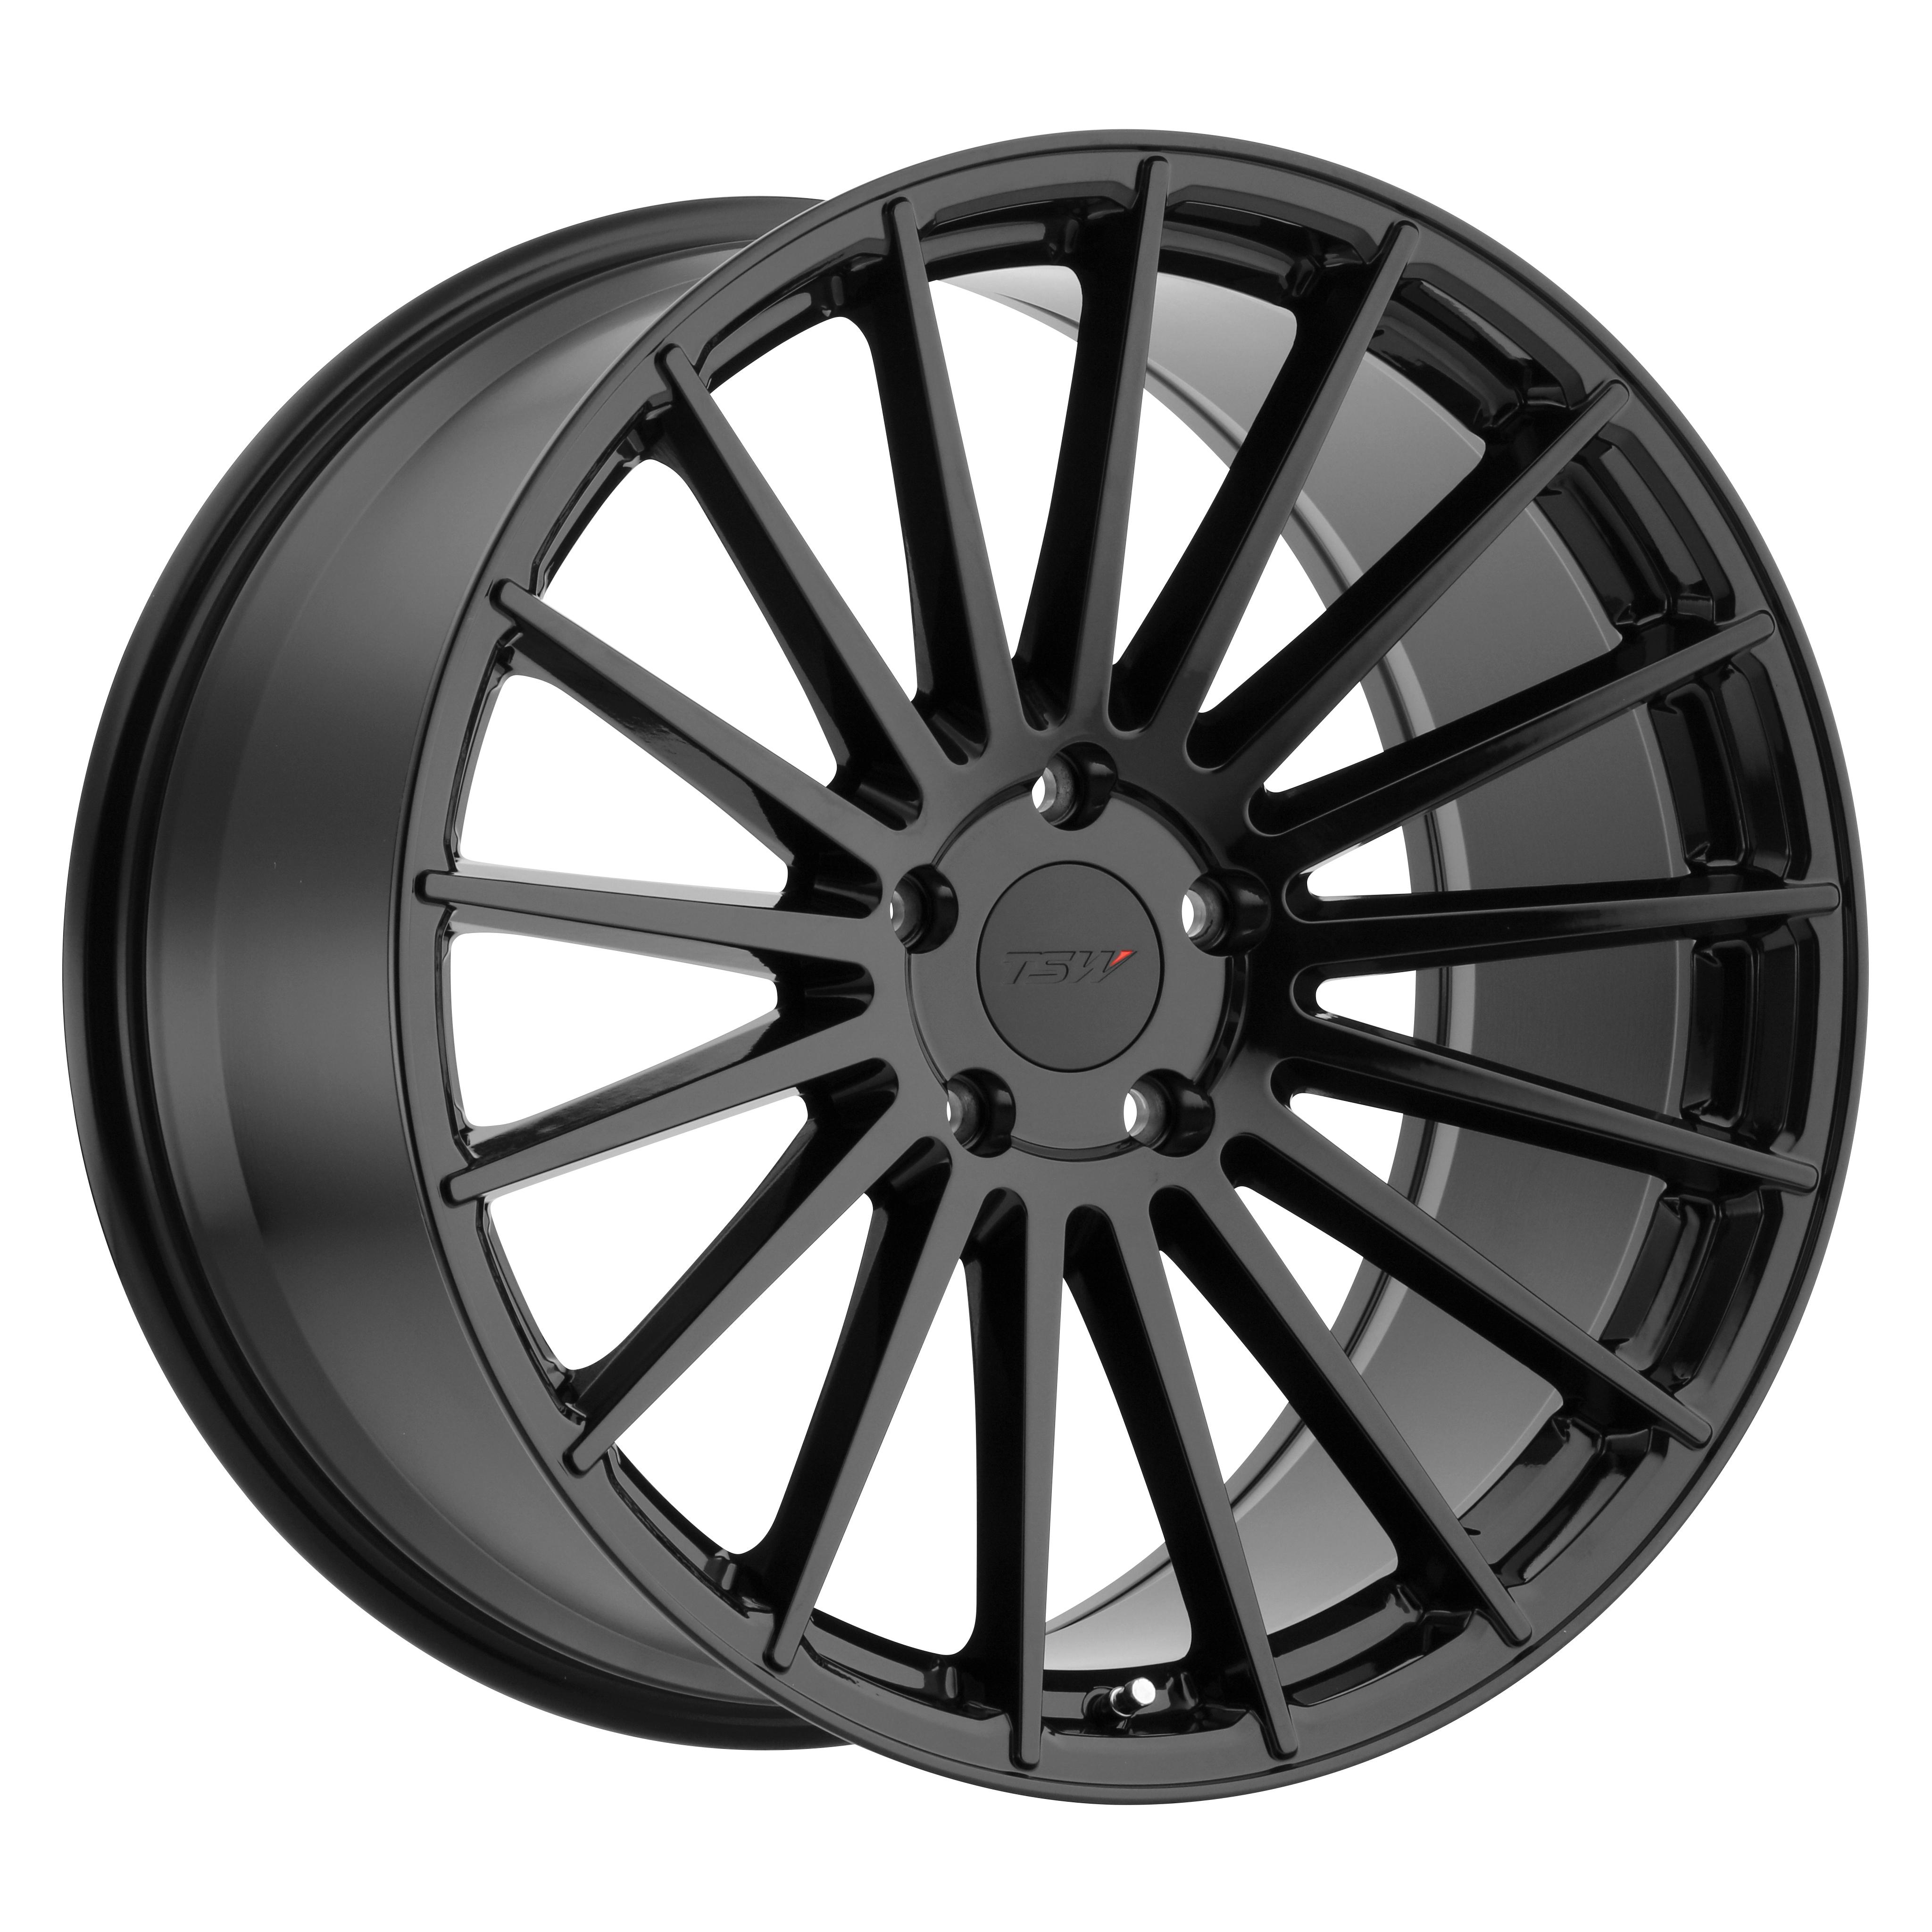 alloy-wheels-rims-tsw-luco-5-lug-gloss-black-std-org.jpg